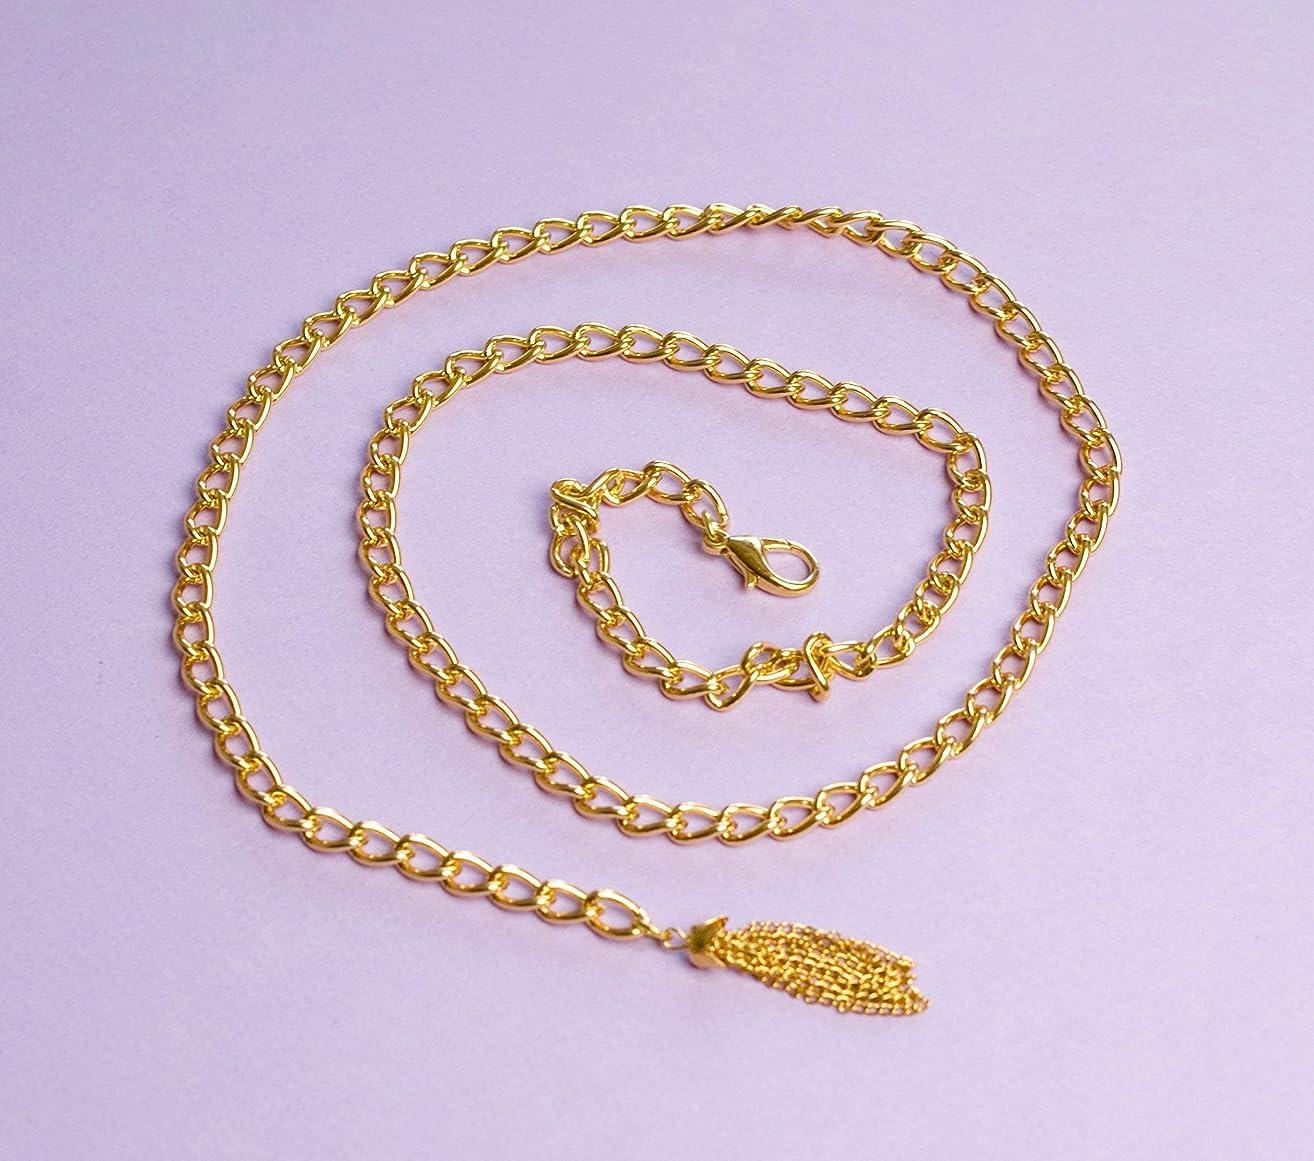 Gold Chain Belt with Tassel PLUS SIZE and REGULAR Retro 90s Waist Belt